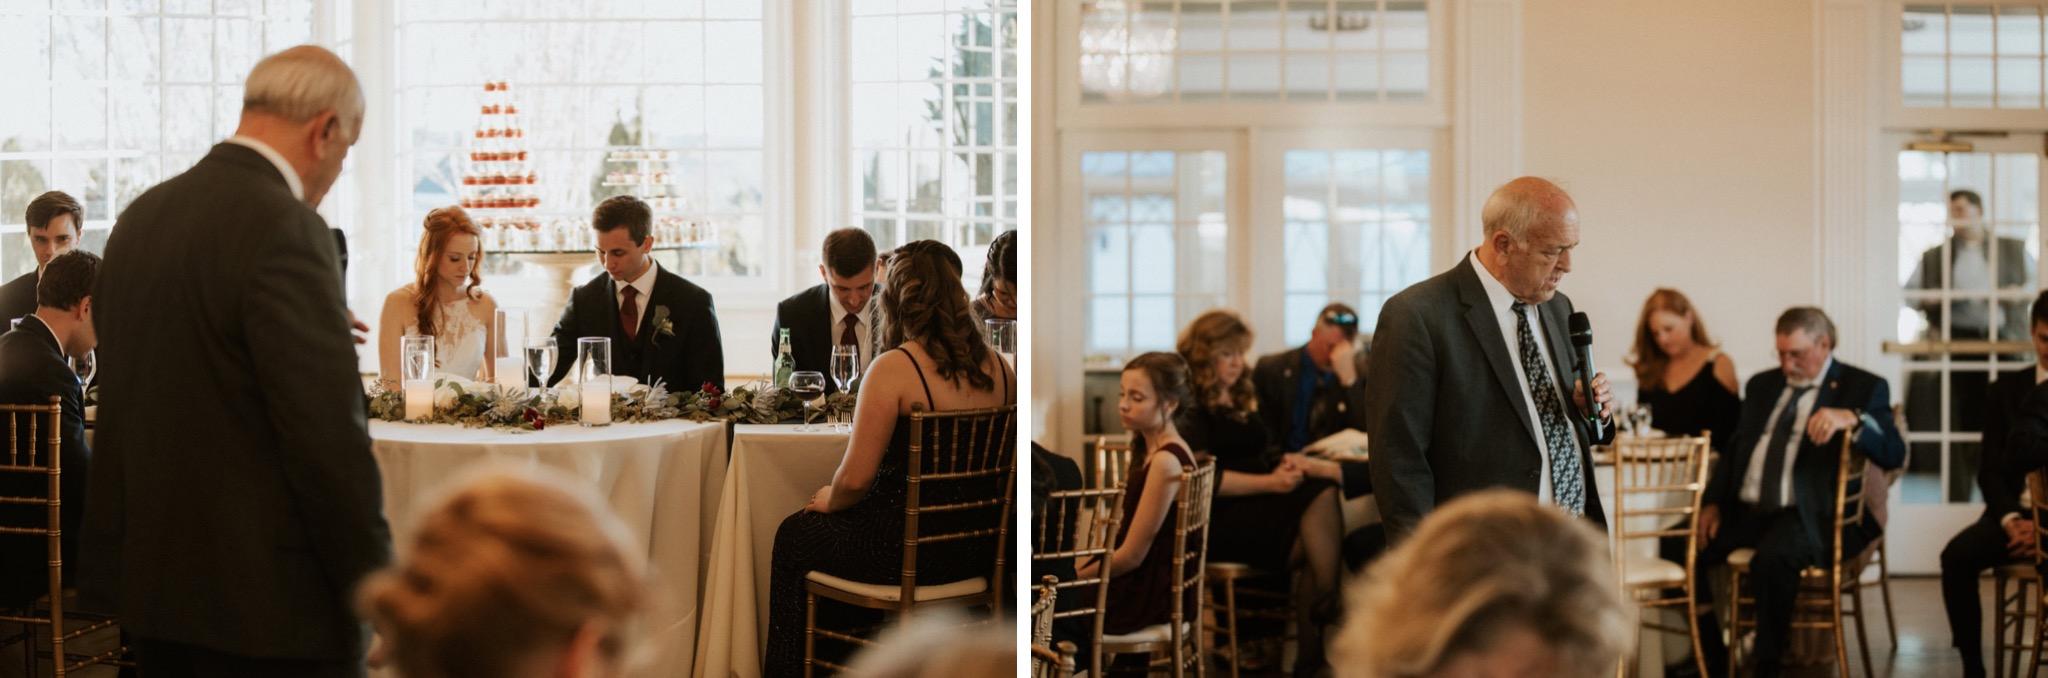 78_West Manor Estate Weddings - Pat Cori Photography-169_West Manor Estate Weddings - Pat Cori Photography-170_VirginiaWeddingPhotographer_toasts_WestManorEstate_Weddingvenue_Wedding.jpg